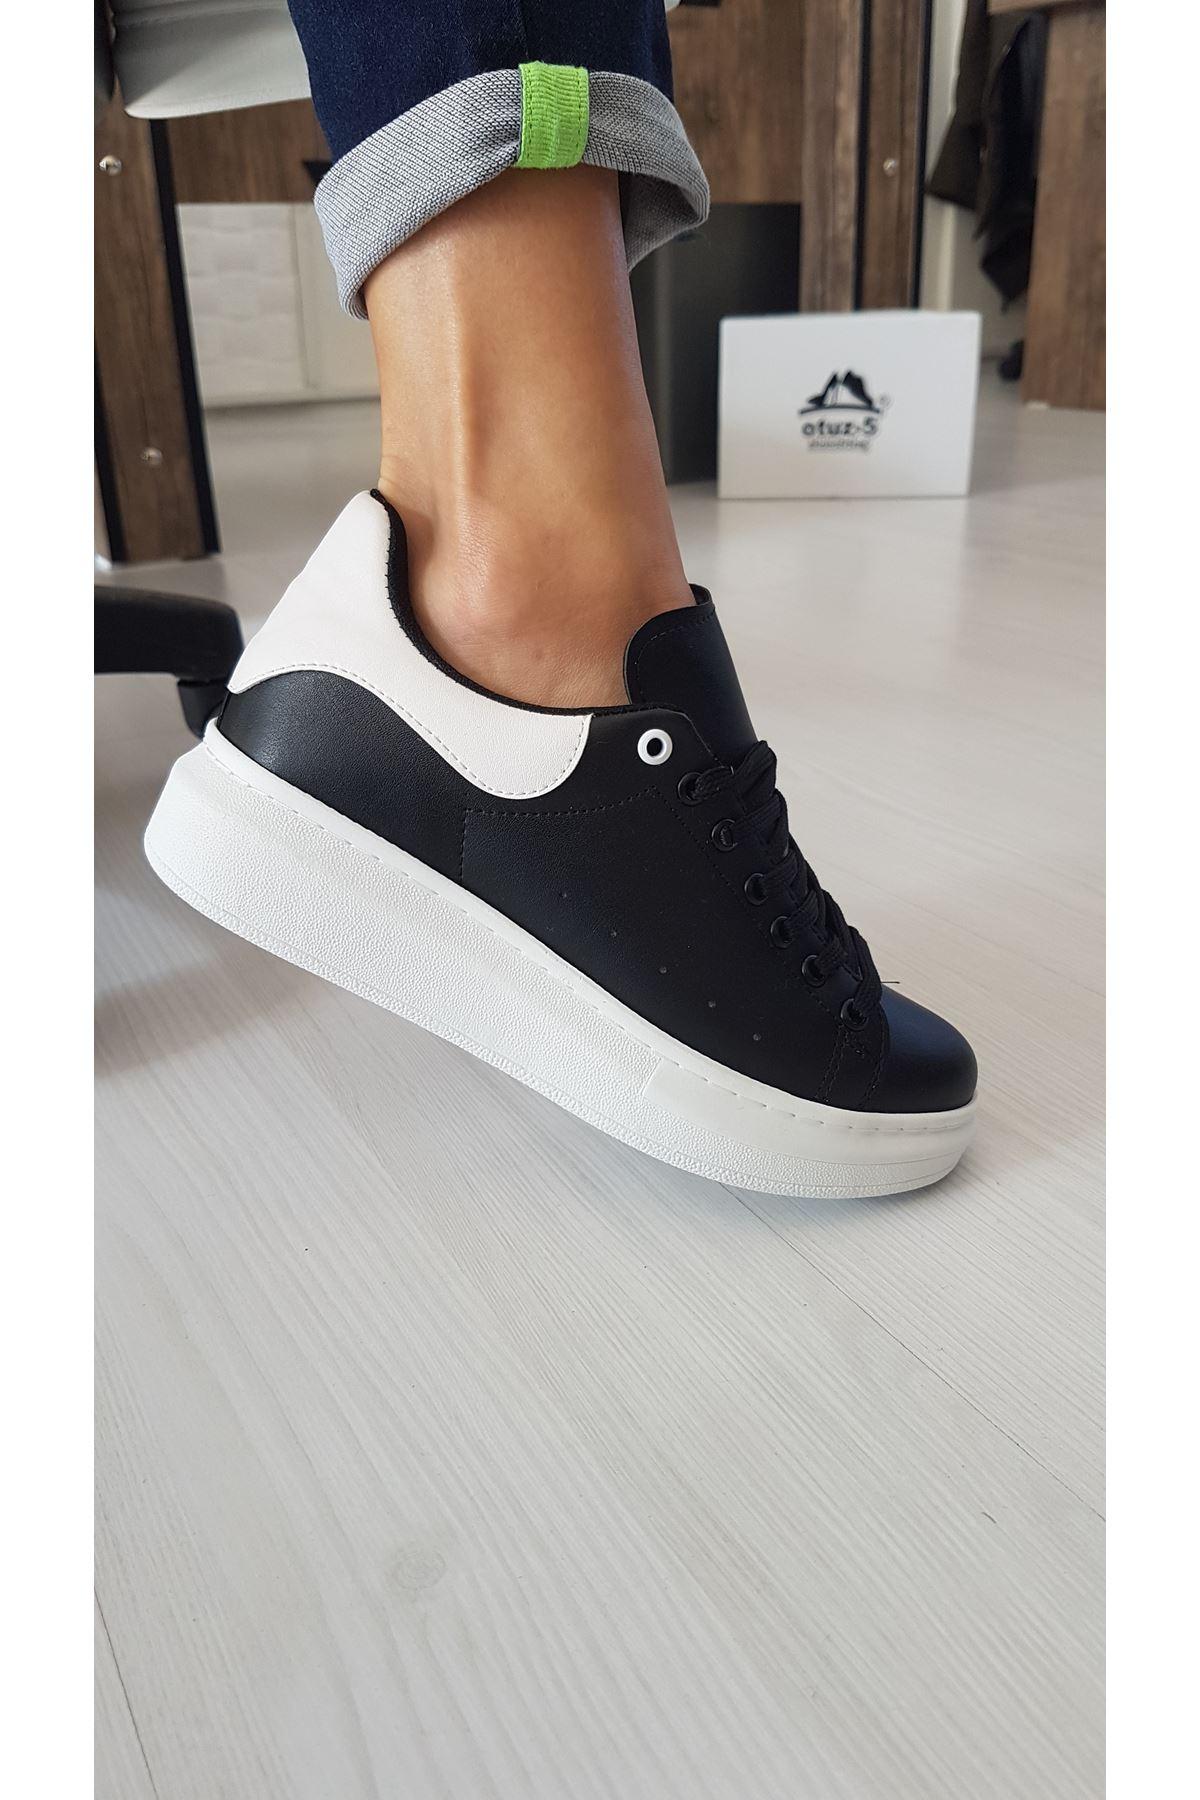 Lucy Mat Deri Beyaz Cilt Detay Sneakers Siyah